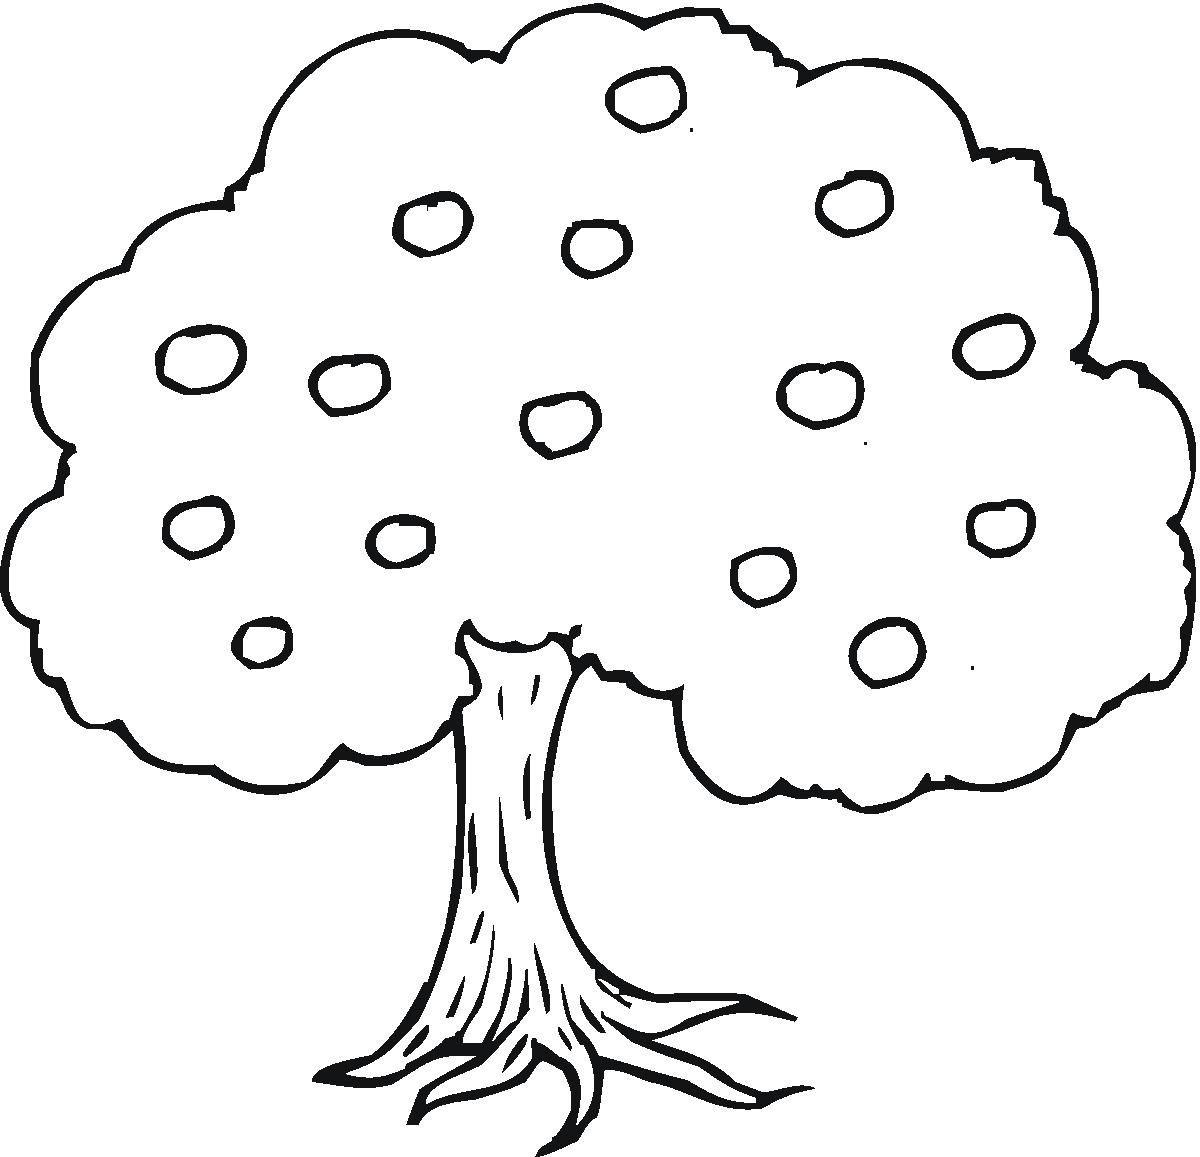 Apple Tree Free Coloring Book Page Preschool